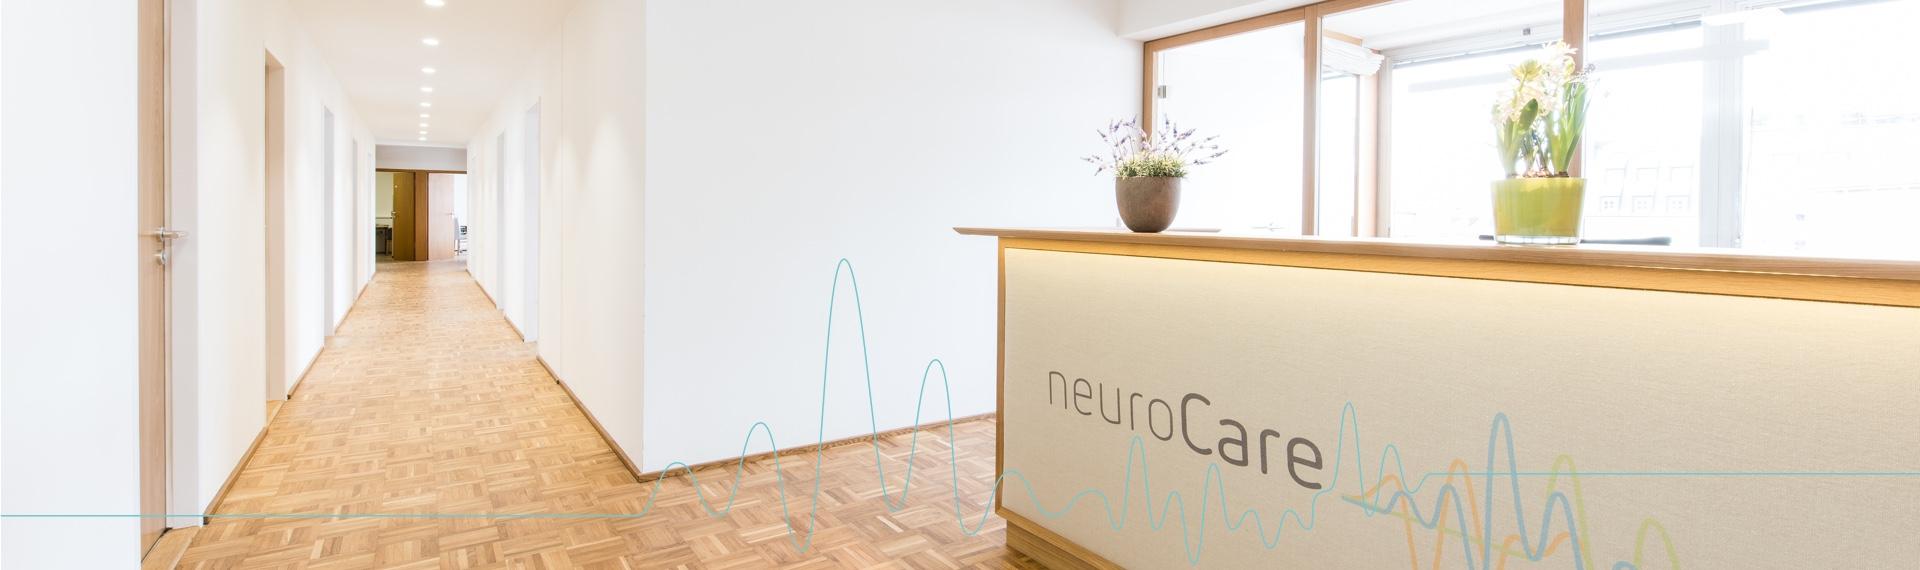 Neurocare Clinics Location